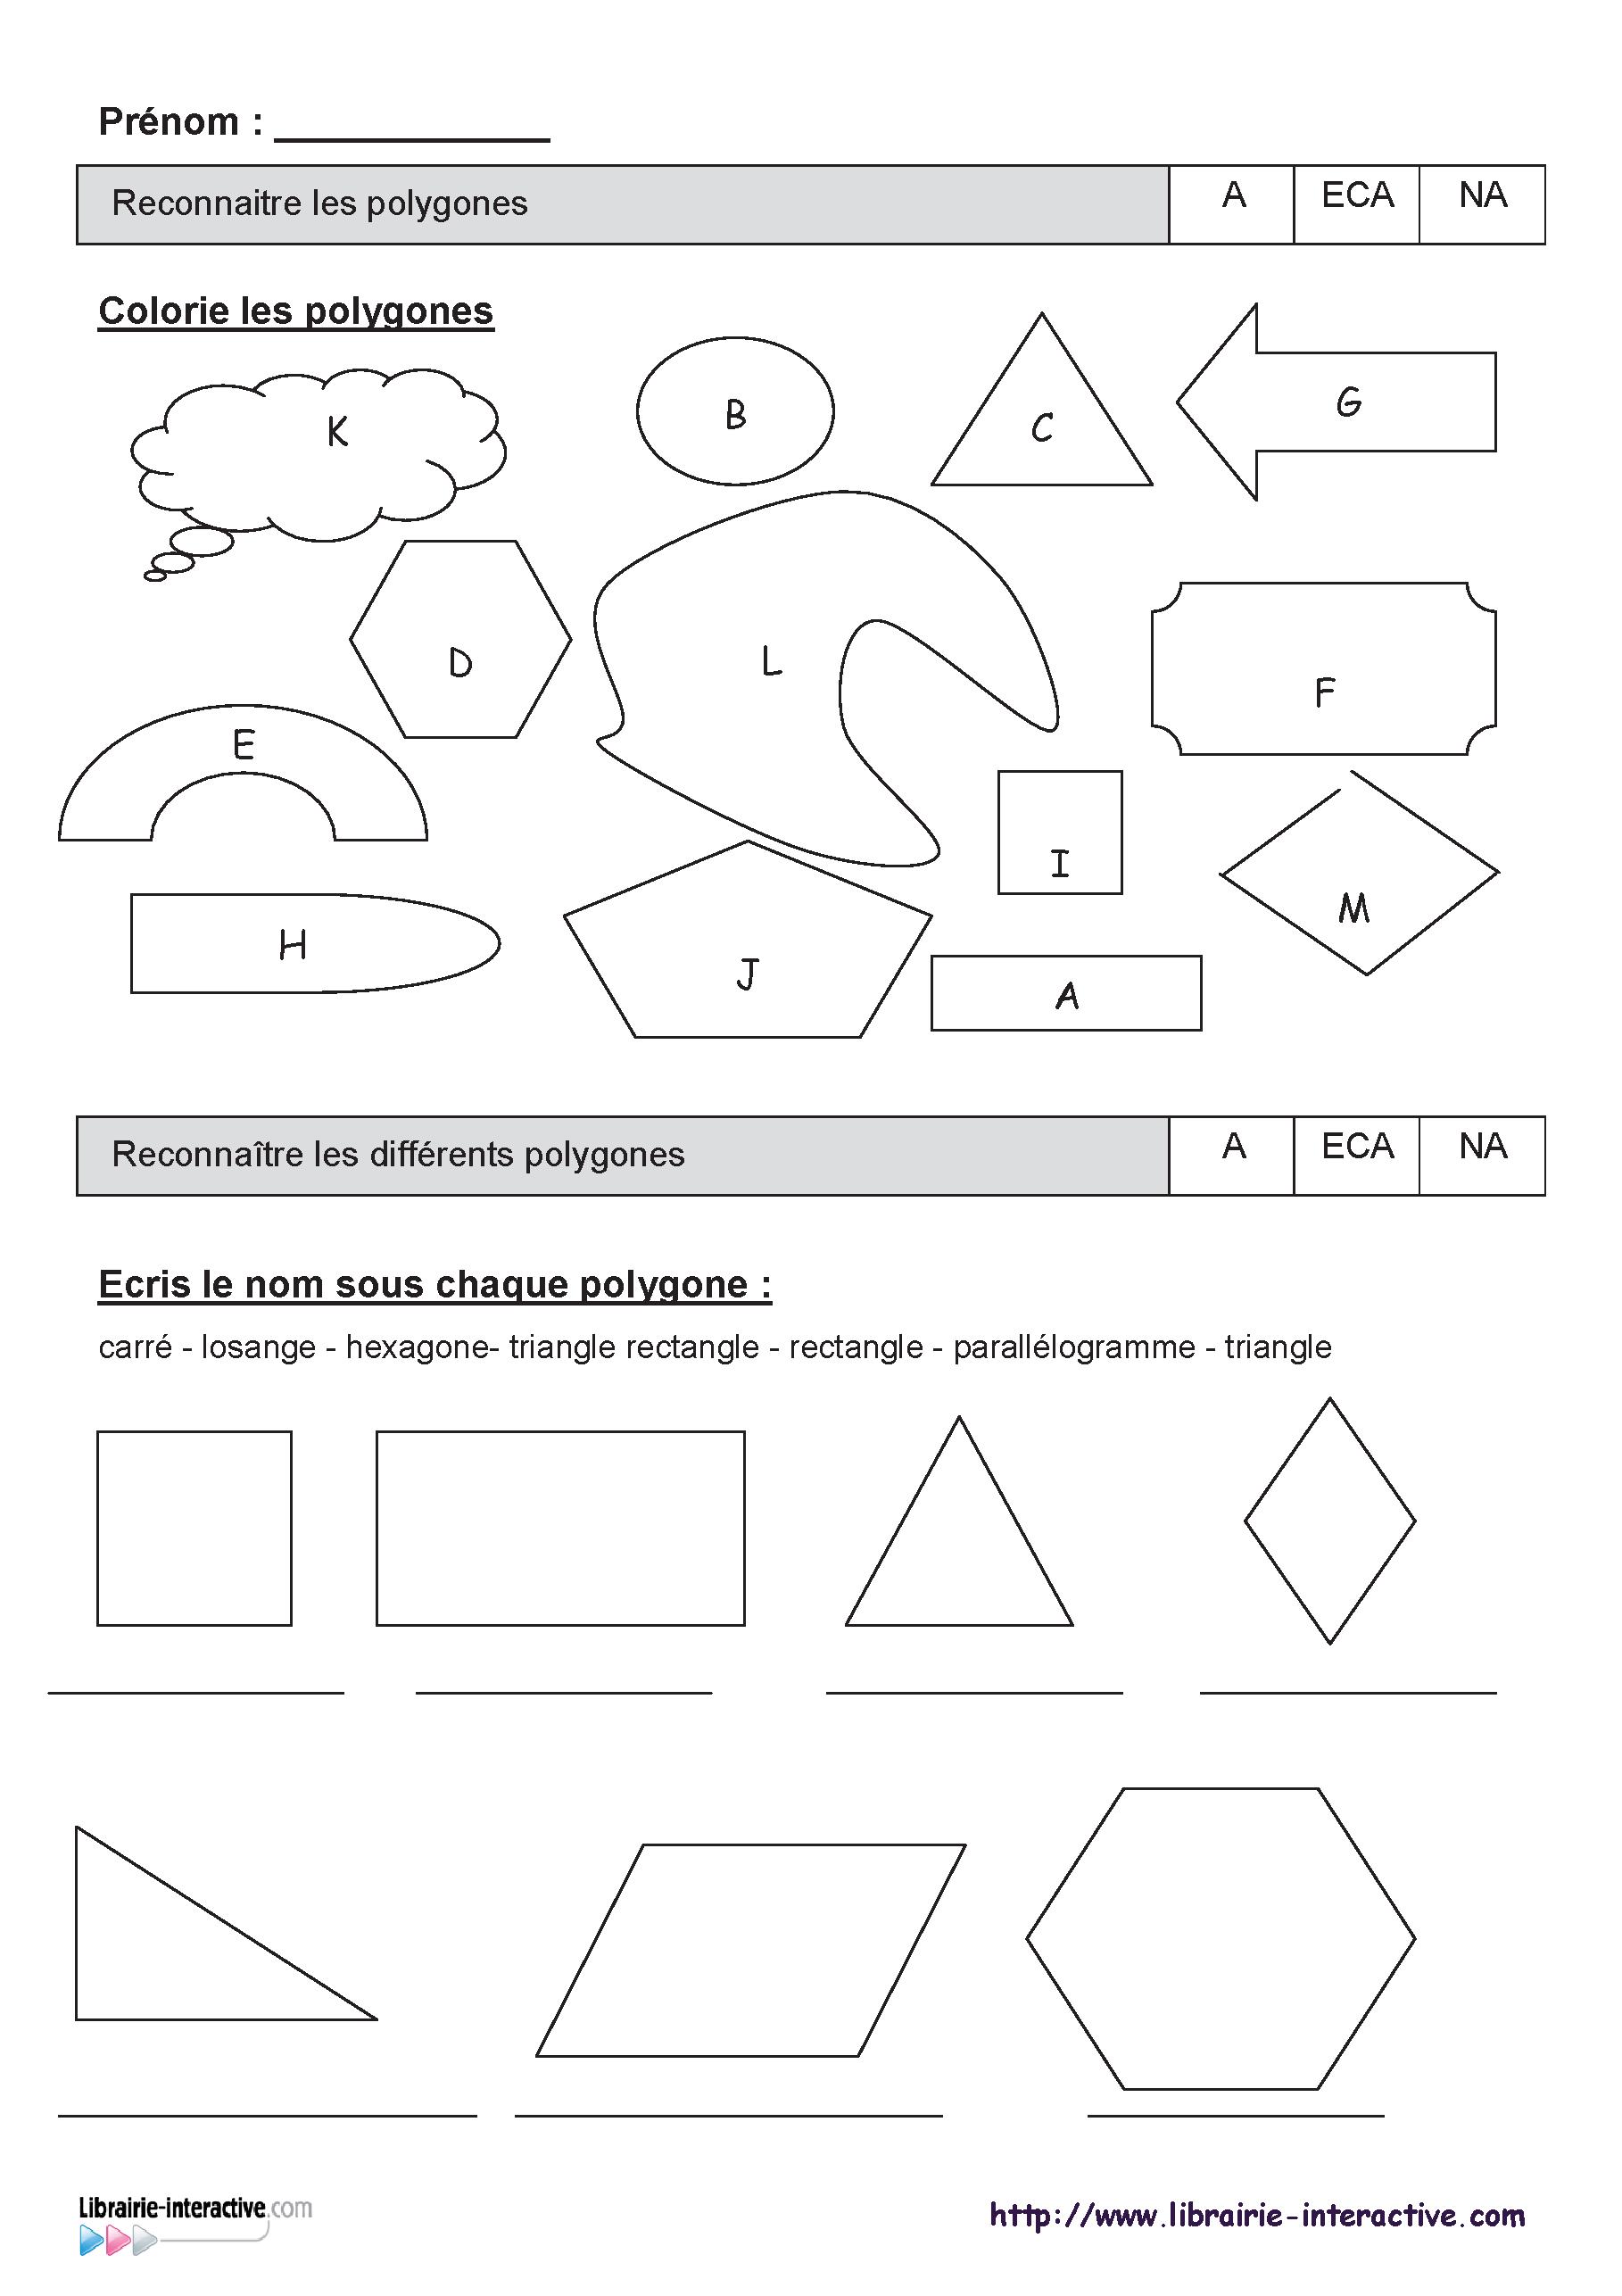 Librairie Interactive Evaluation Polygones Et Mesures Geometrie Ce1 Geometrie Ce2 Evaluation Geometrie Ce2